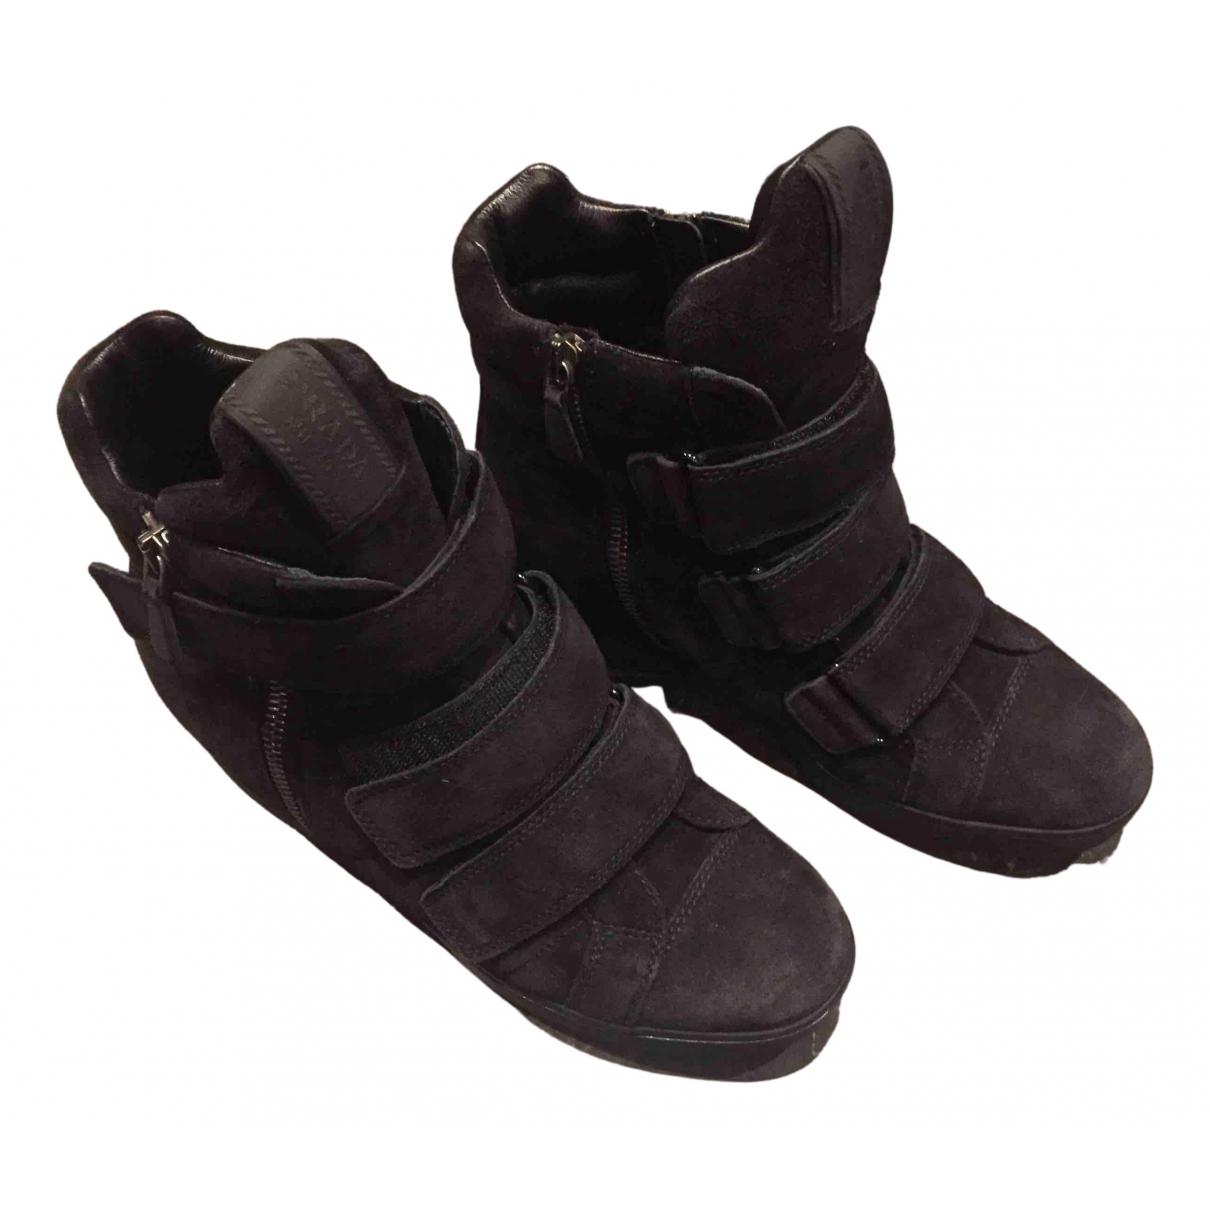 Prada \N Black Suede Boots for Women 37 EU